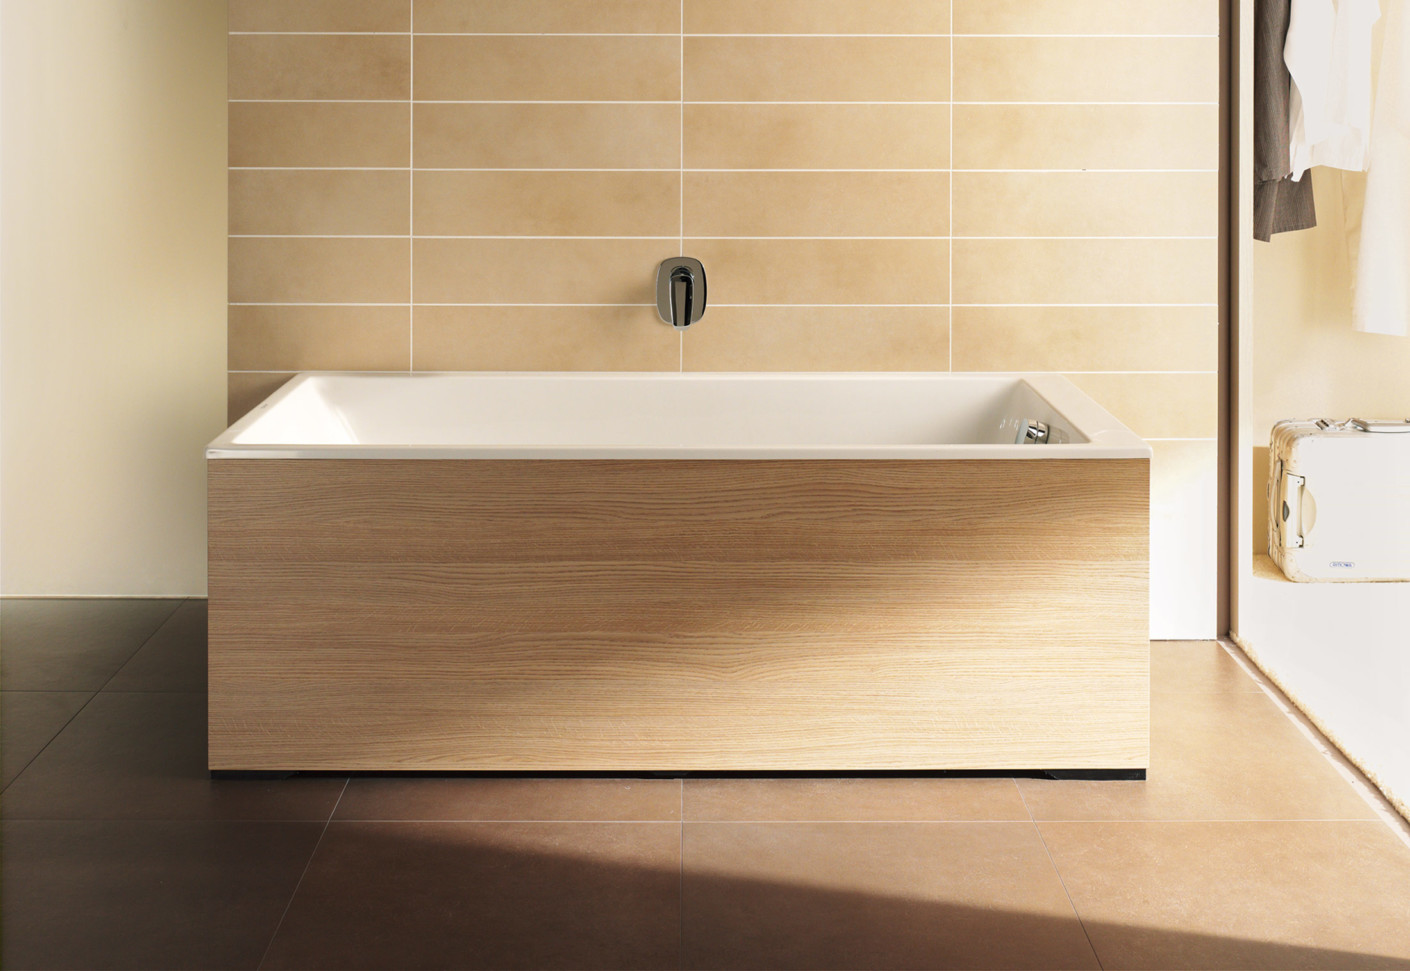 Onto Bath Tub By Duravit STYLEPARK